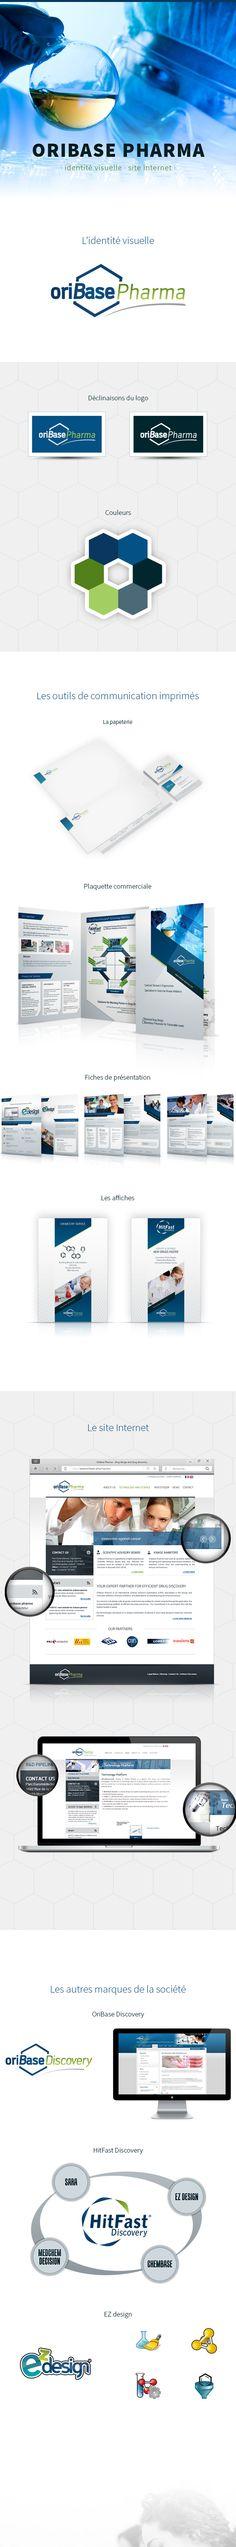 OriBase Pharma by Ramos Jerome, via Behance Behance, Corporate Design